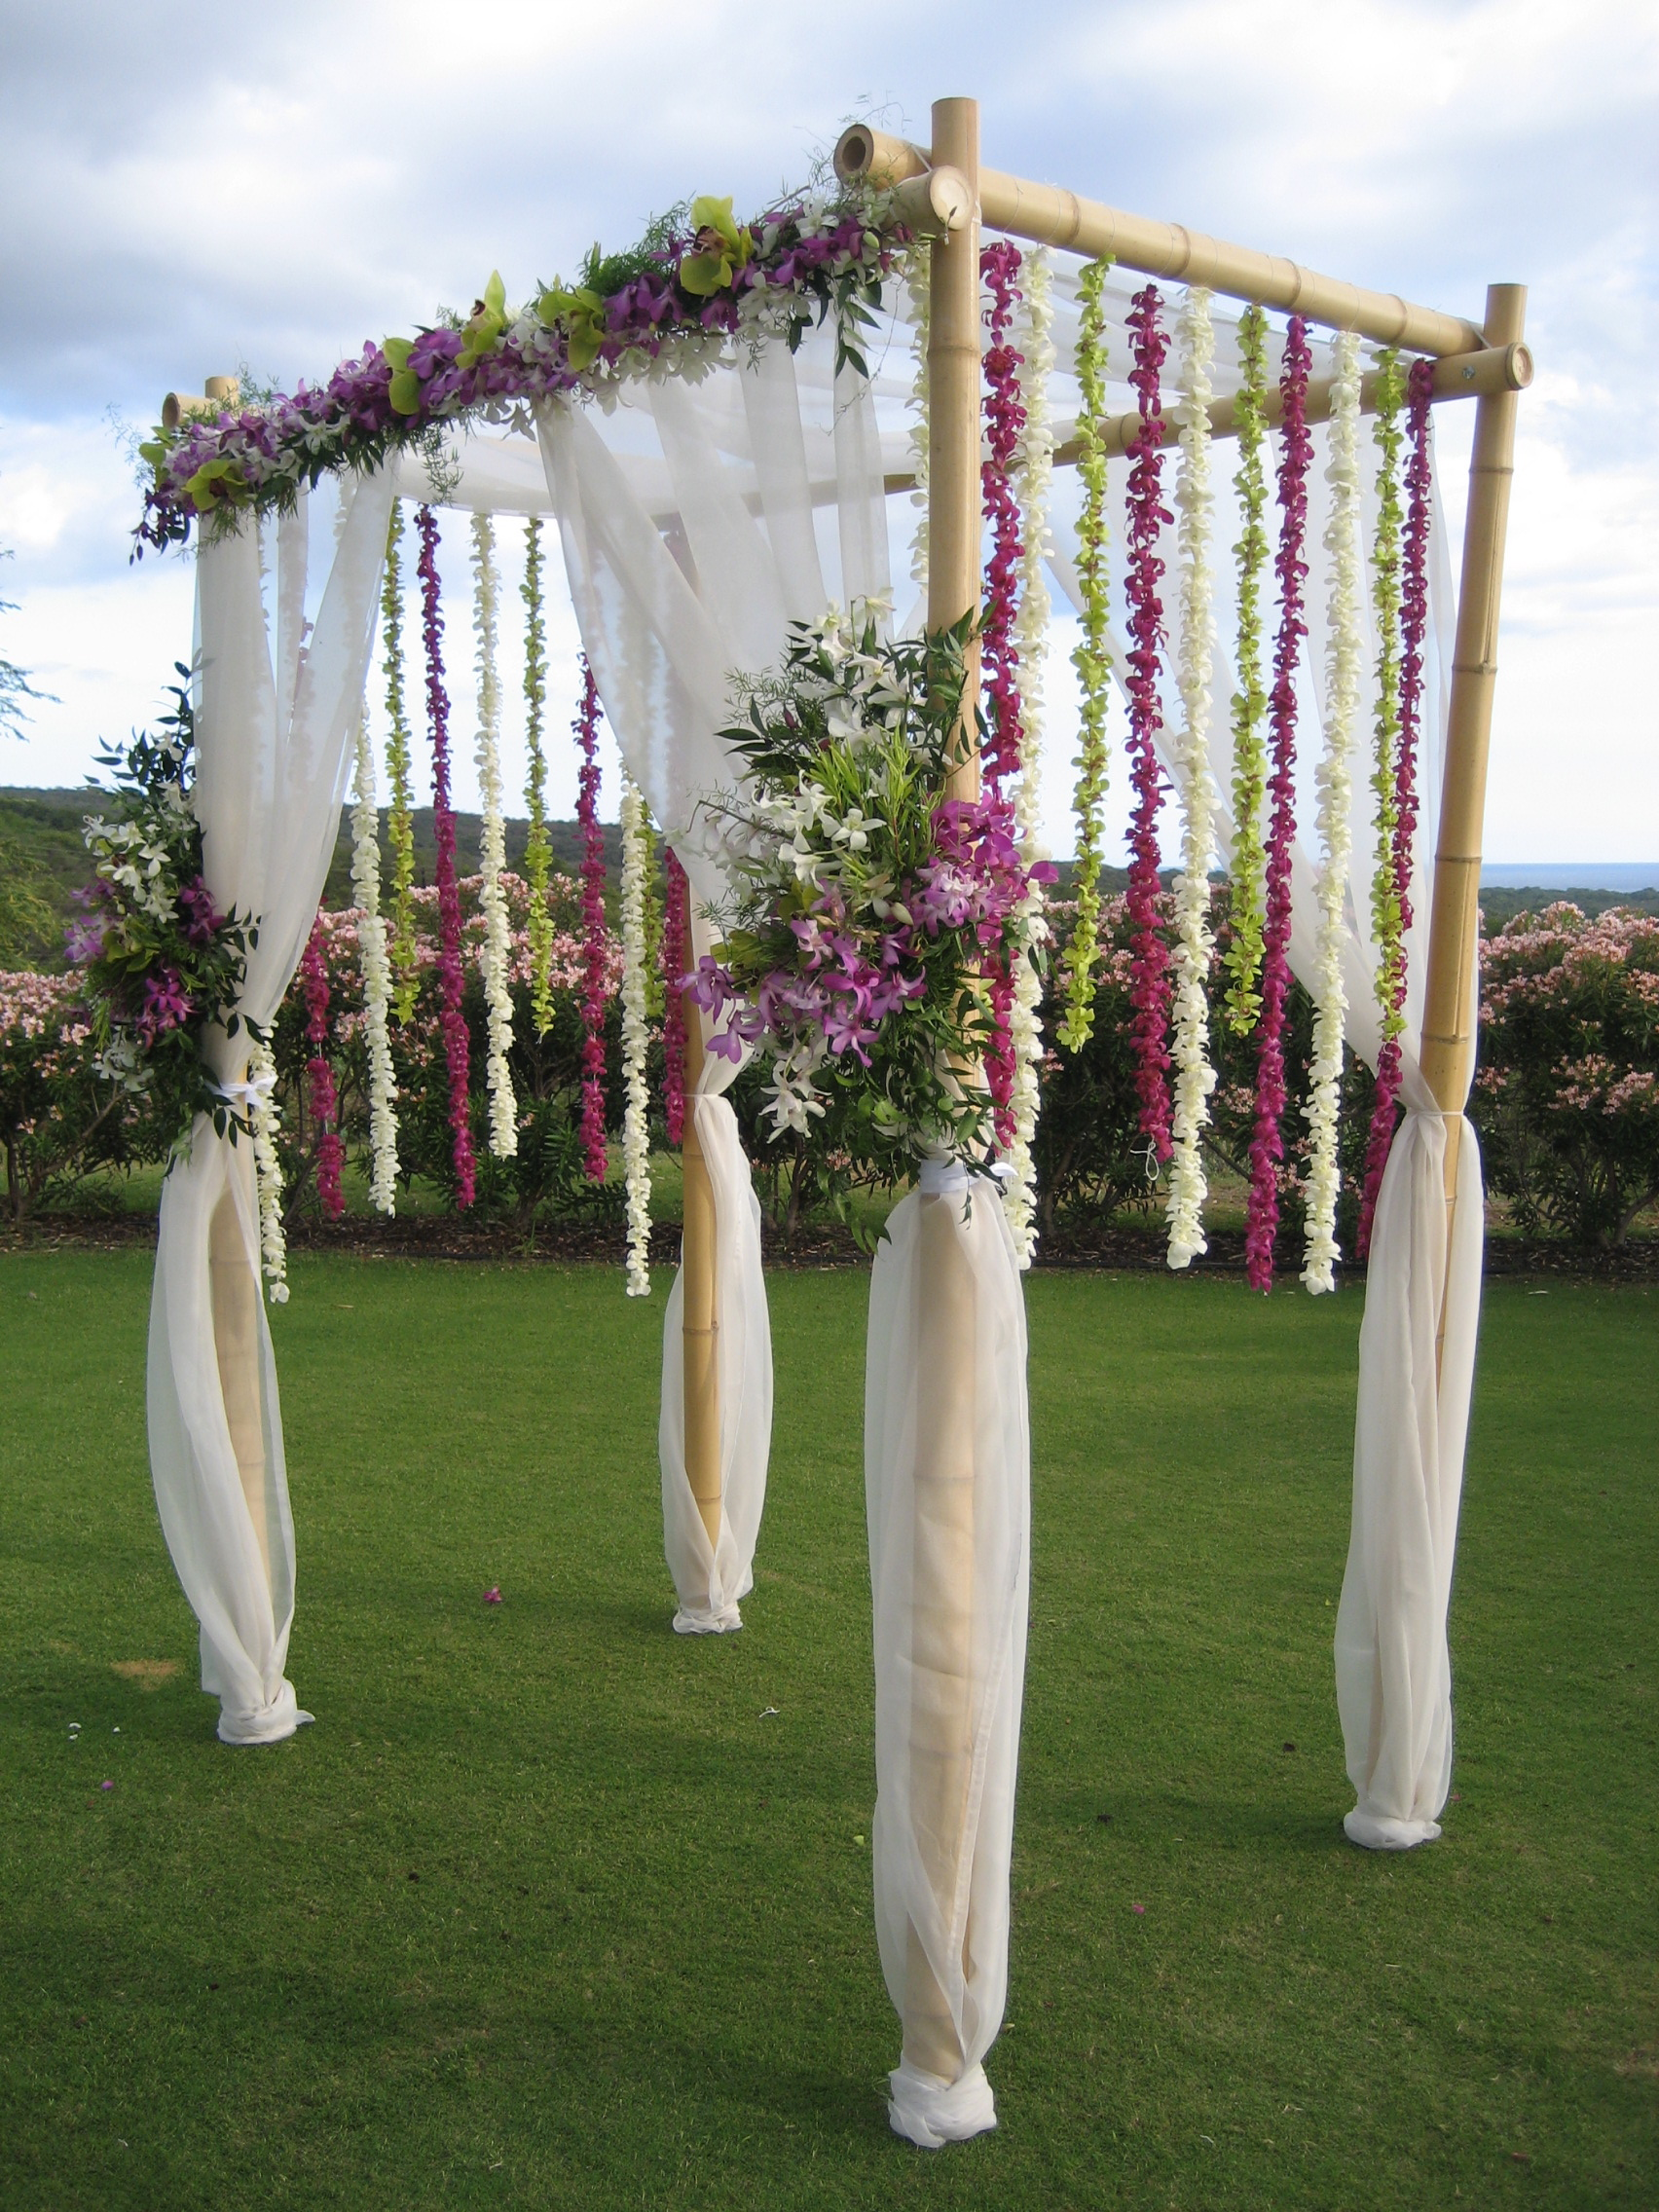 Outdoor Wedding Decoration Ideas | Party Ideas on Backyard Decor  id=31187